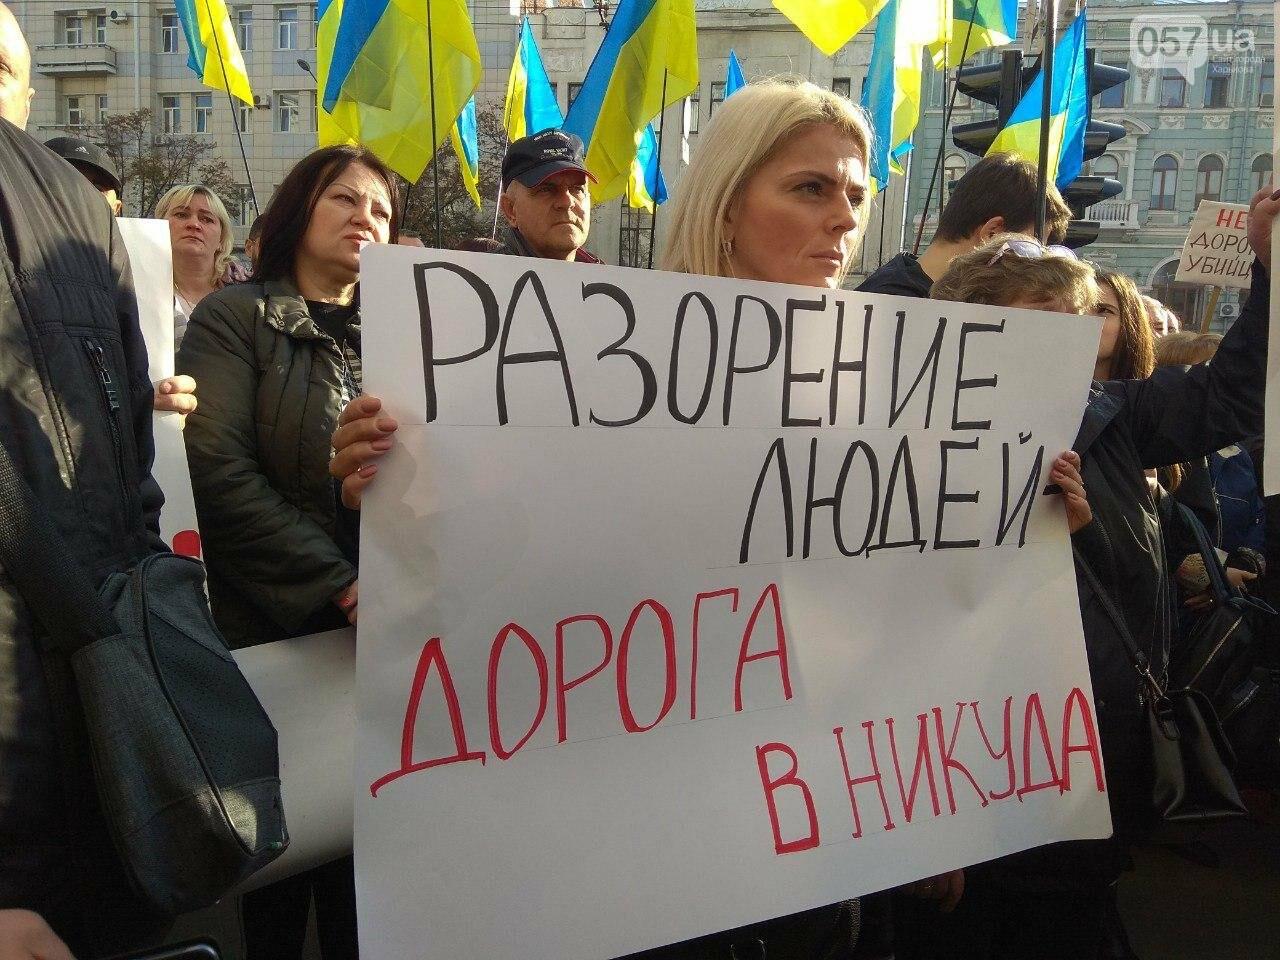 «Нам дорога не нужна»: предприниматели «Барабашово» пикетируют горсовет, - ФОТО, фото-1